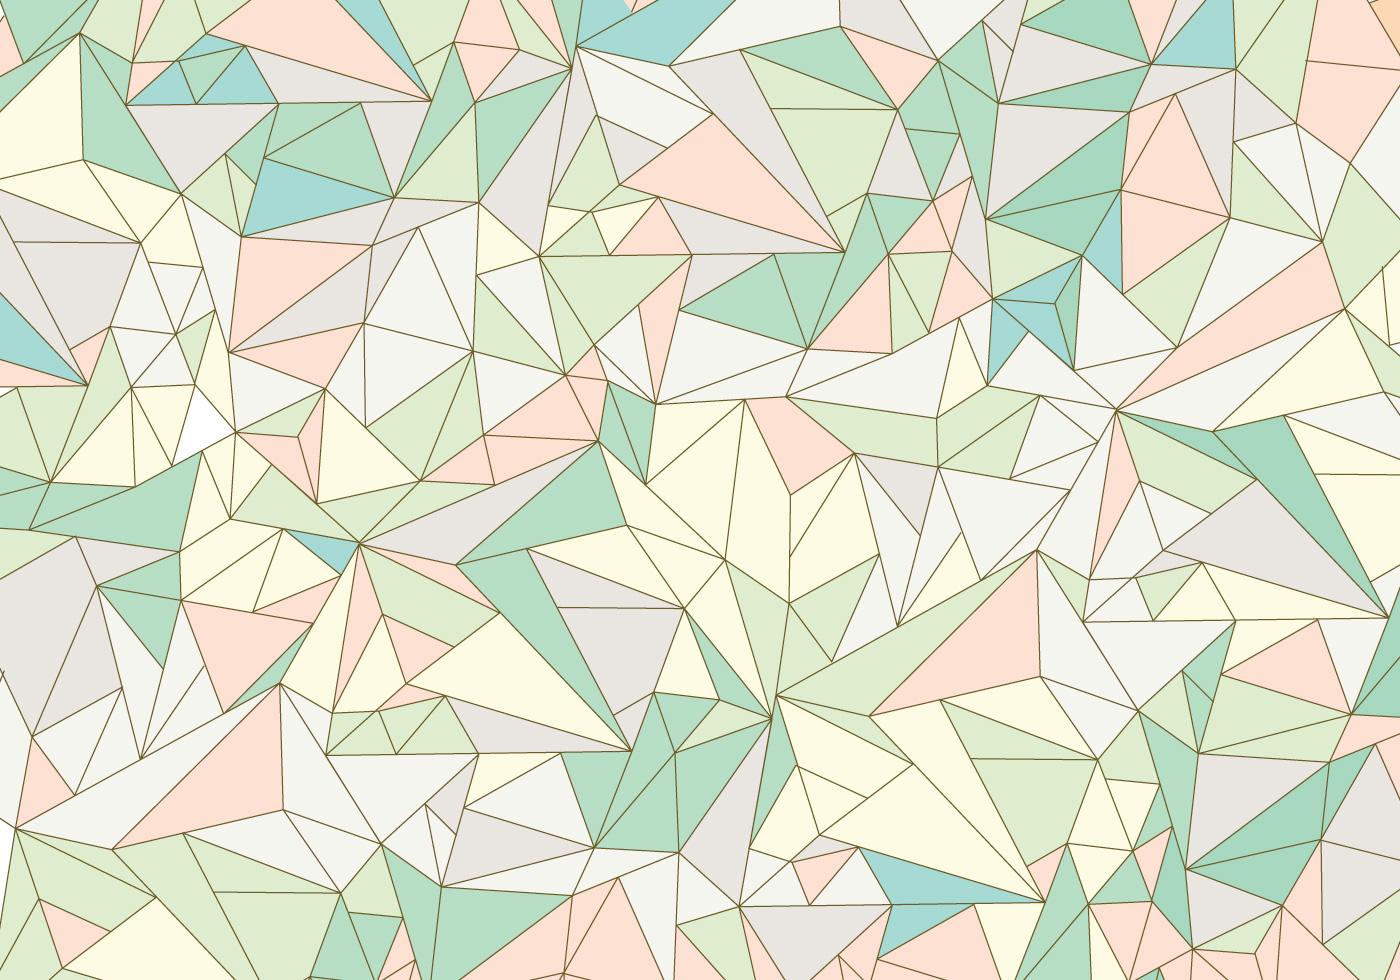 Pastel Abstract Gemstone Pattern